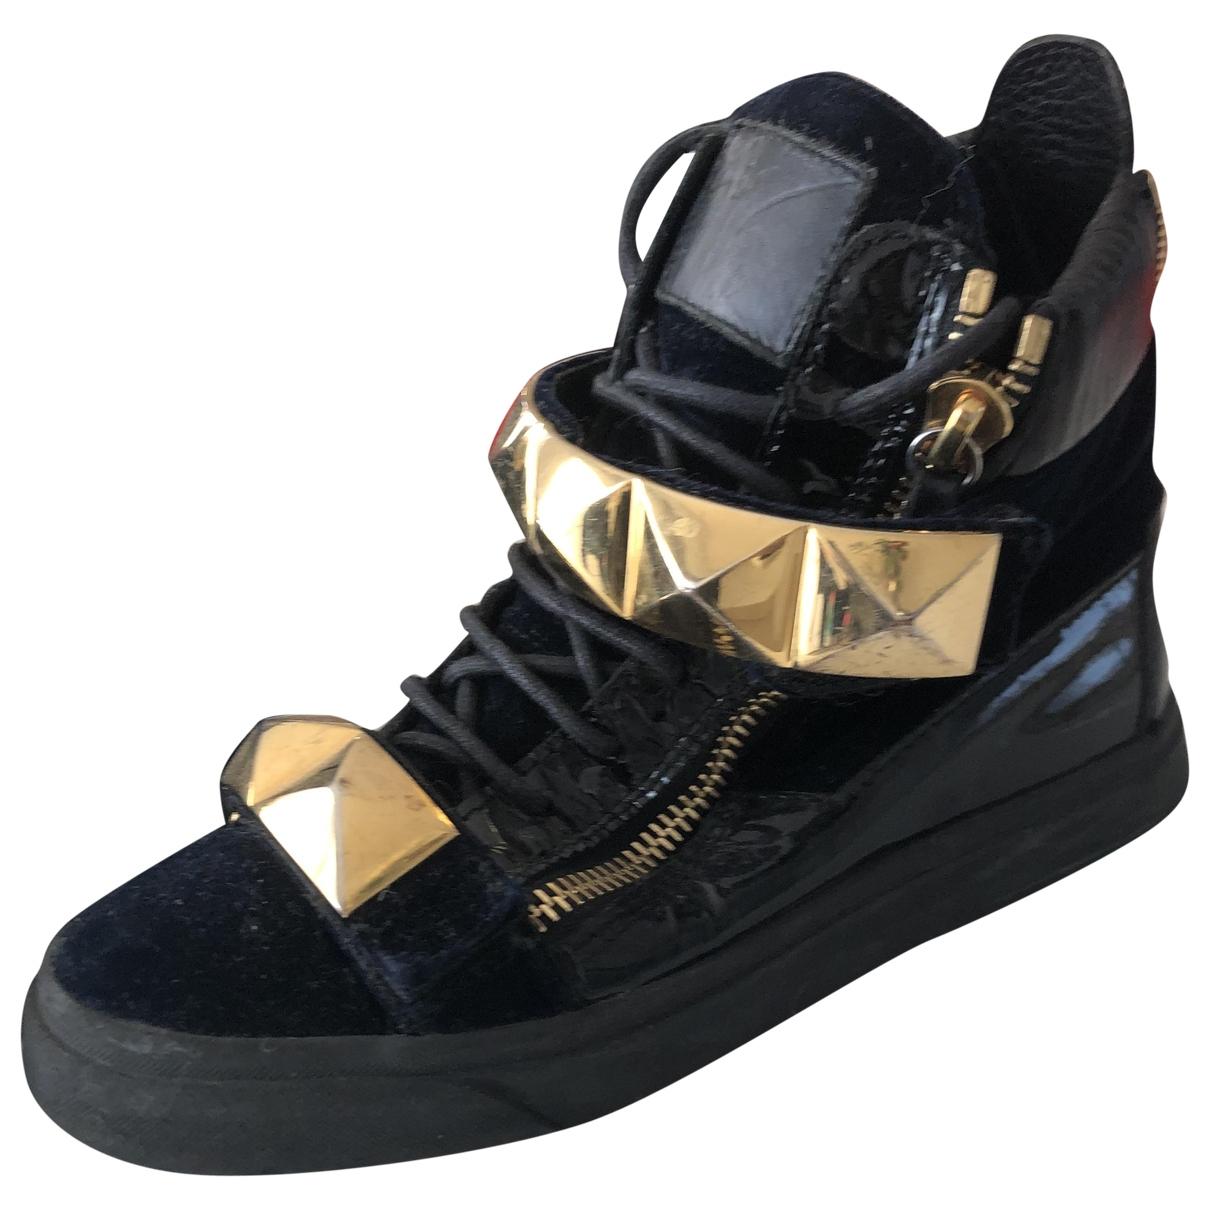 Giuseppe Zanotti - Baskets Donna pour femme en velours - noir